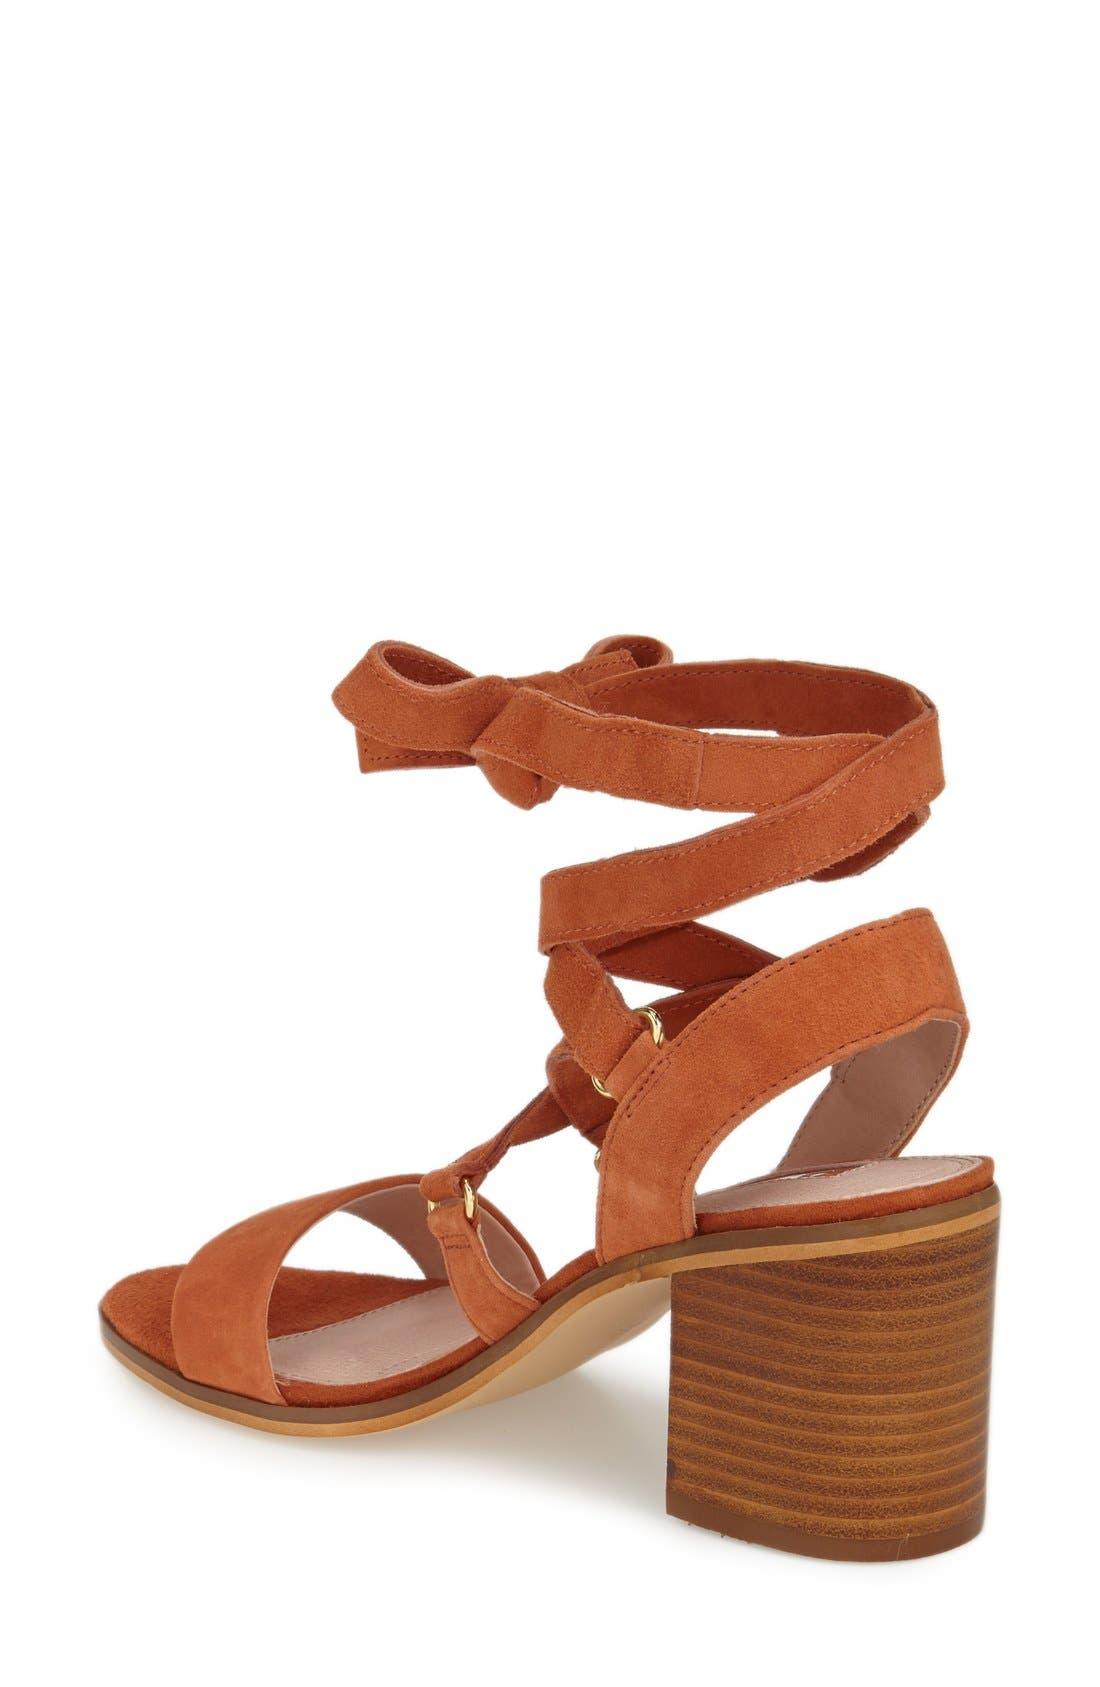 'Nadra' Lace-Up Sandal,                             Alternate thumbnail 2, color,                             Orange Suede